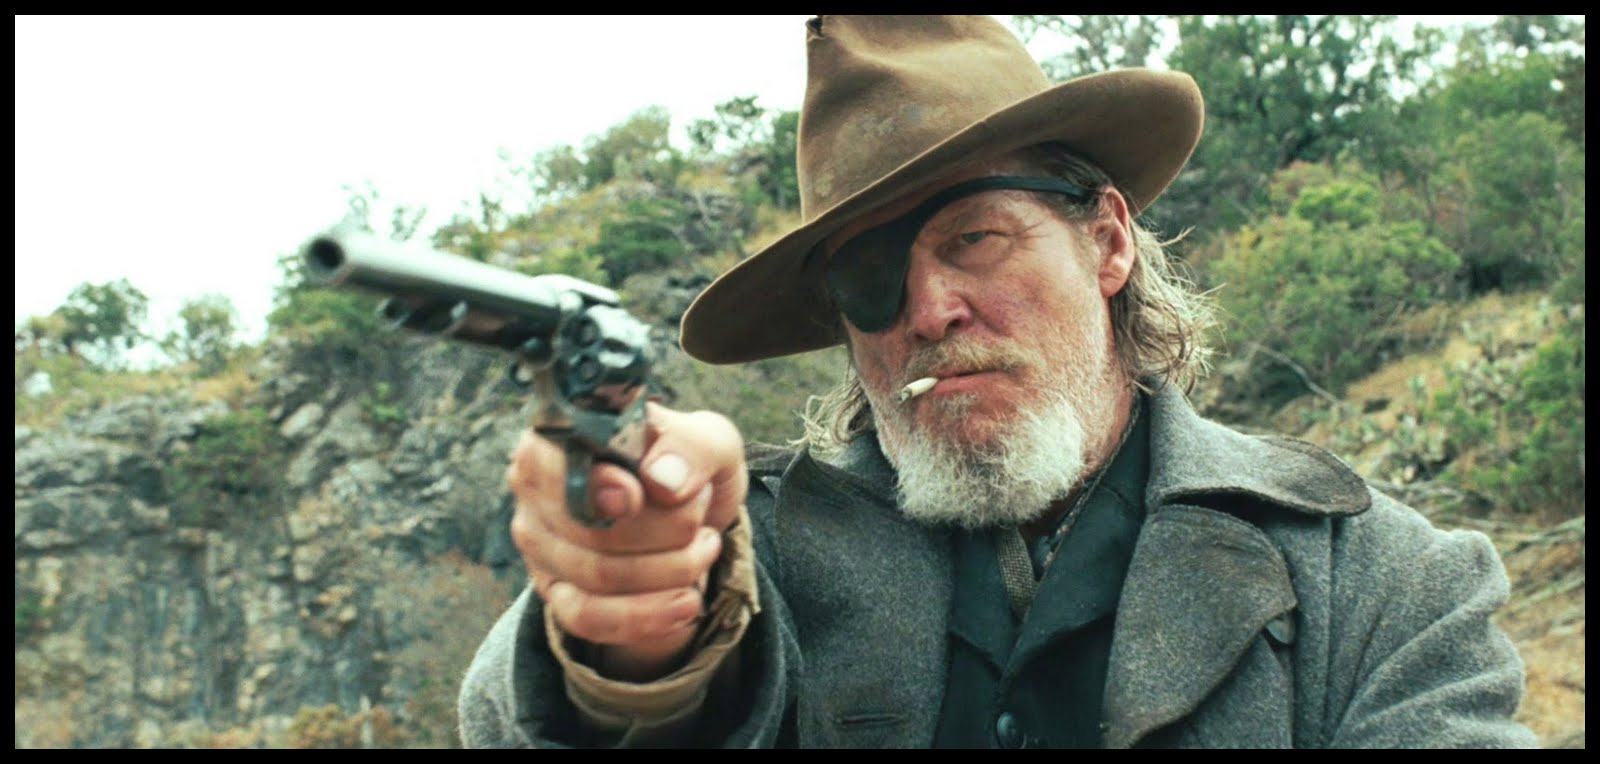 Image tirée du Film TRUE GRIT (2010)